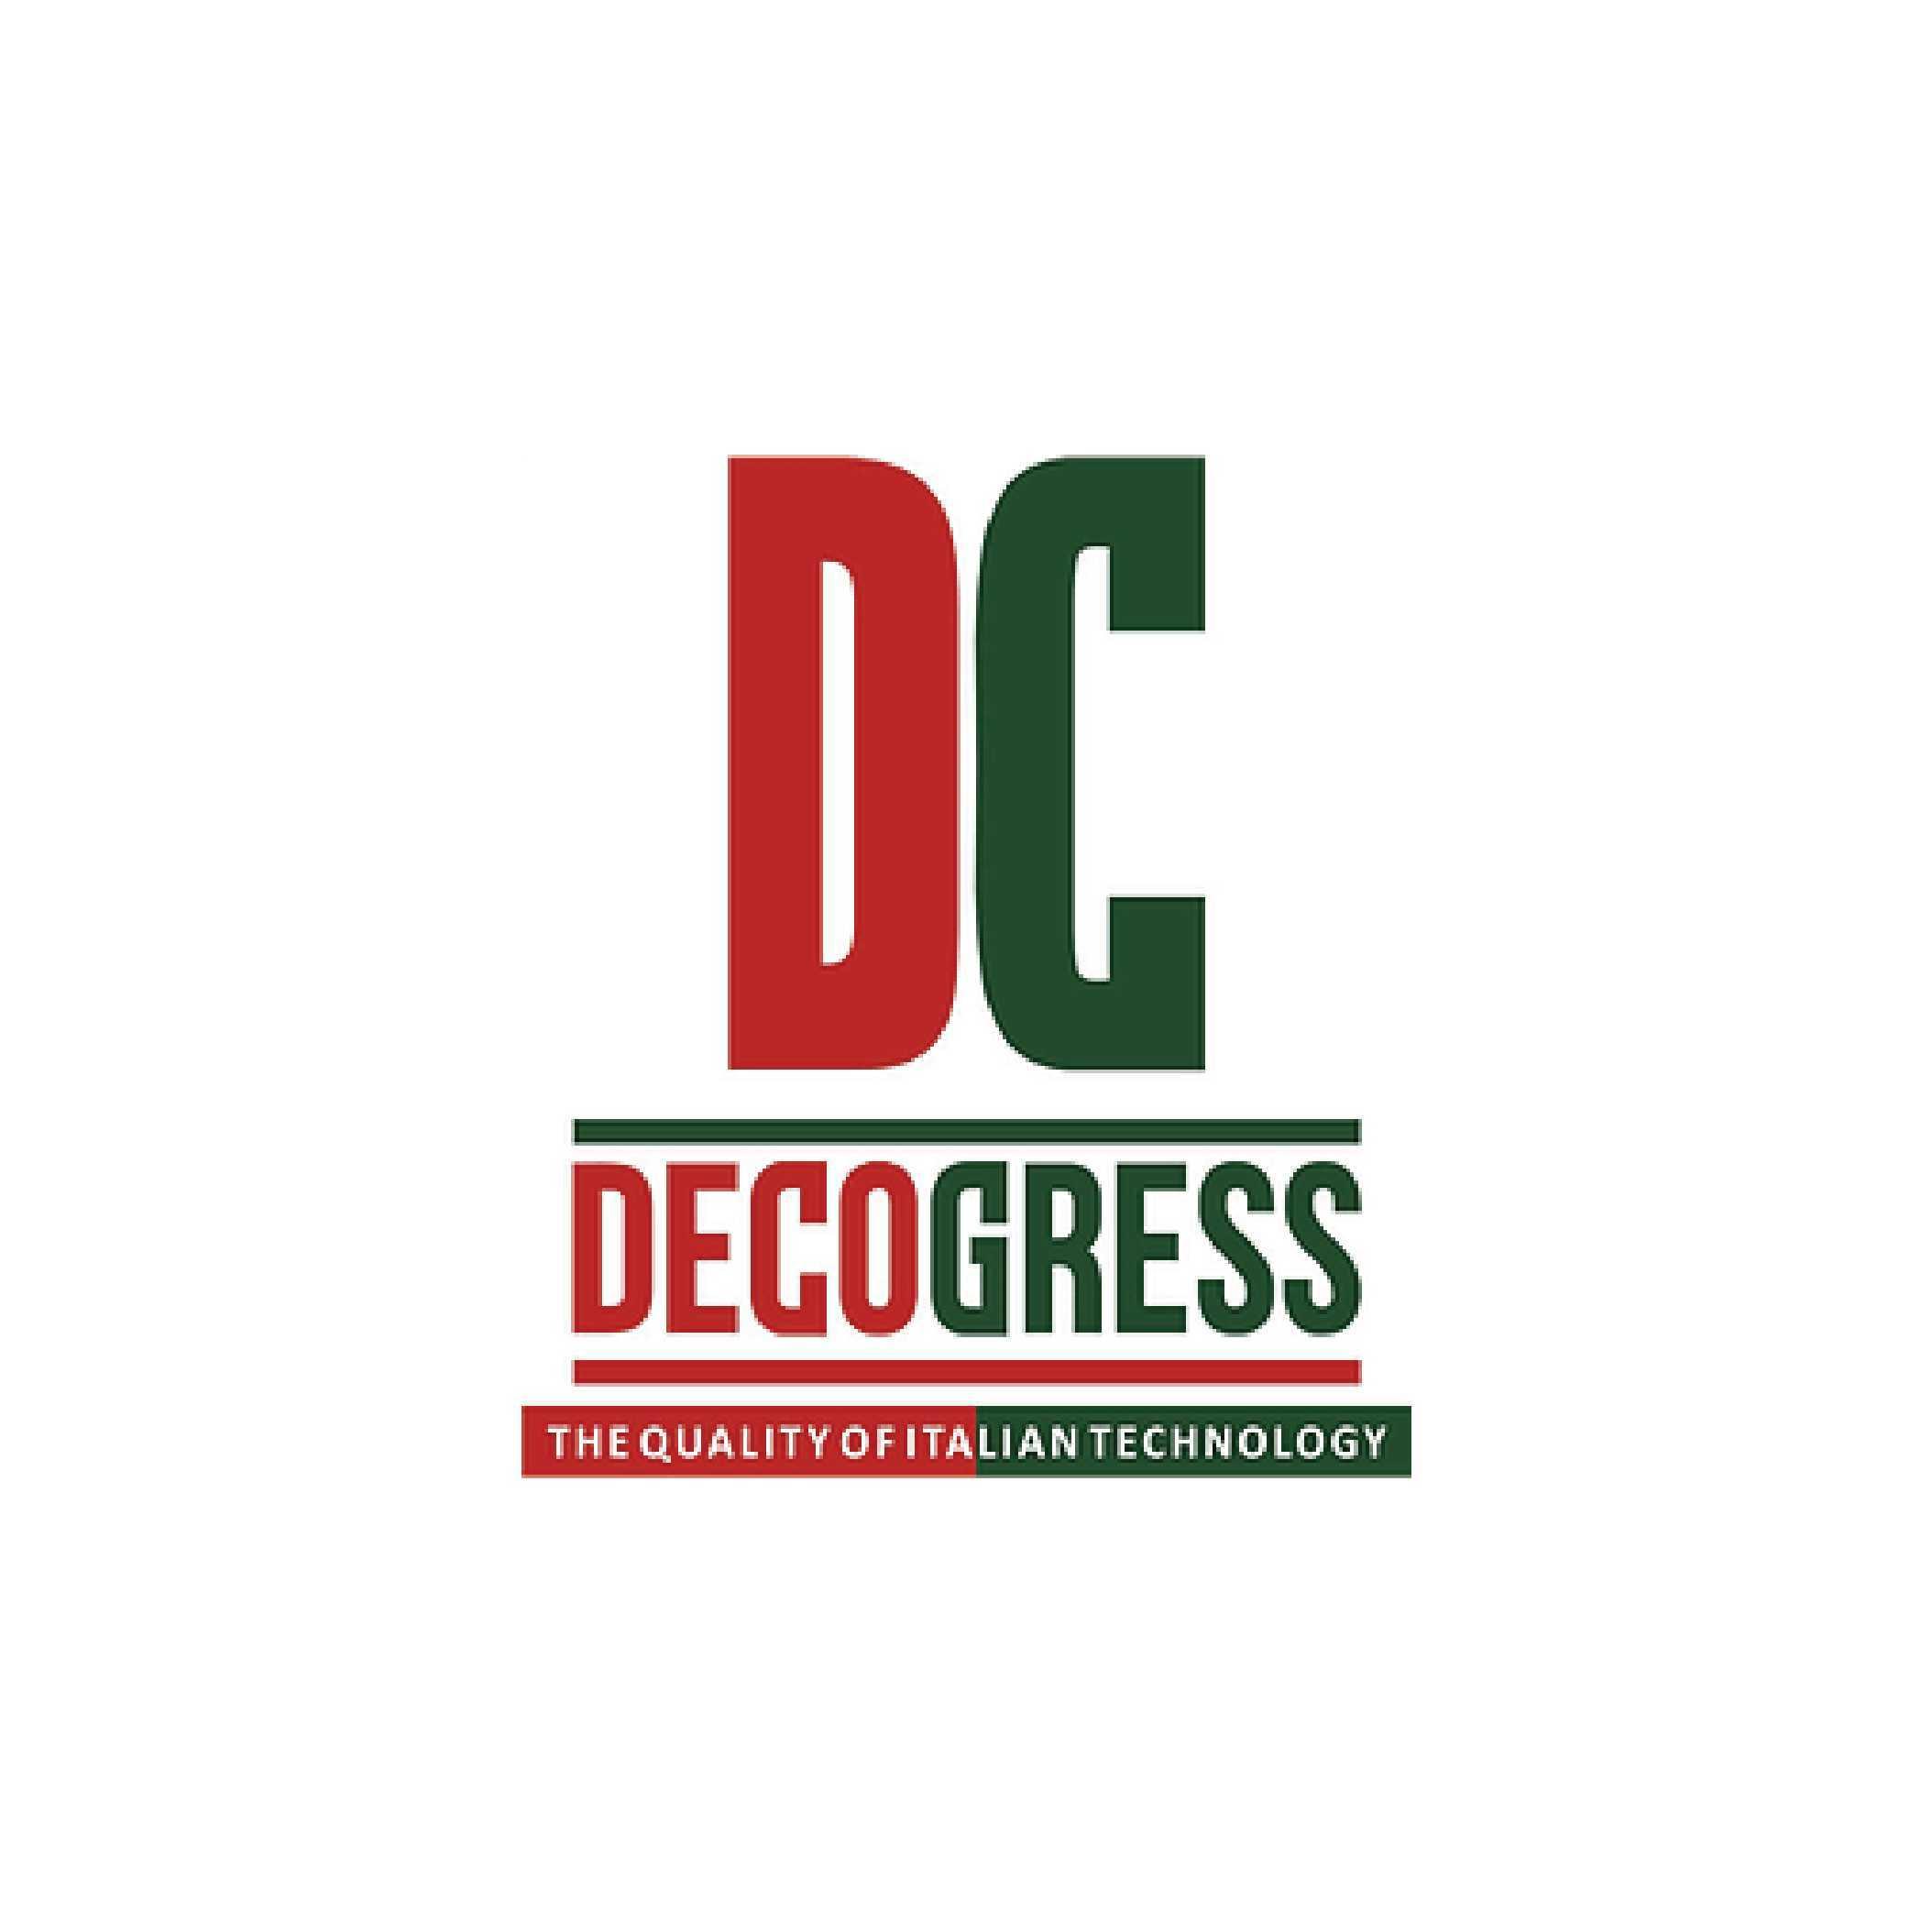 DECOGRESS